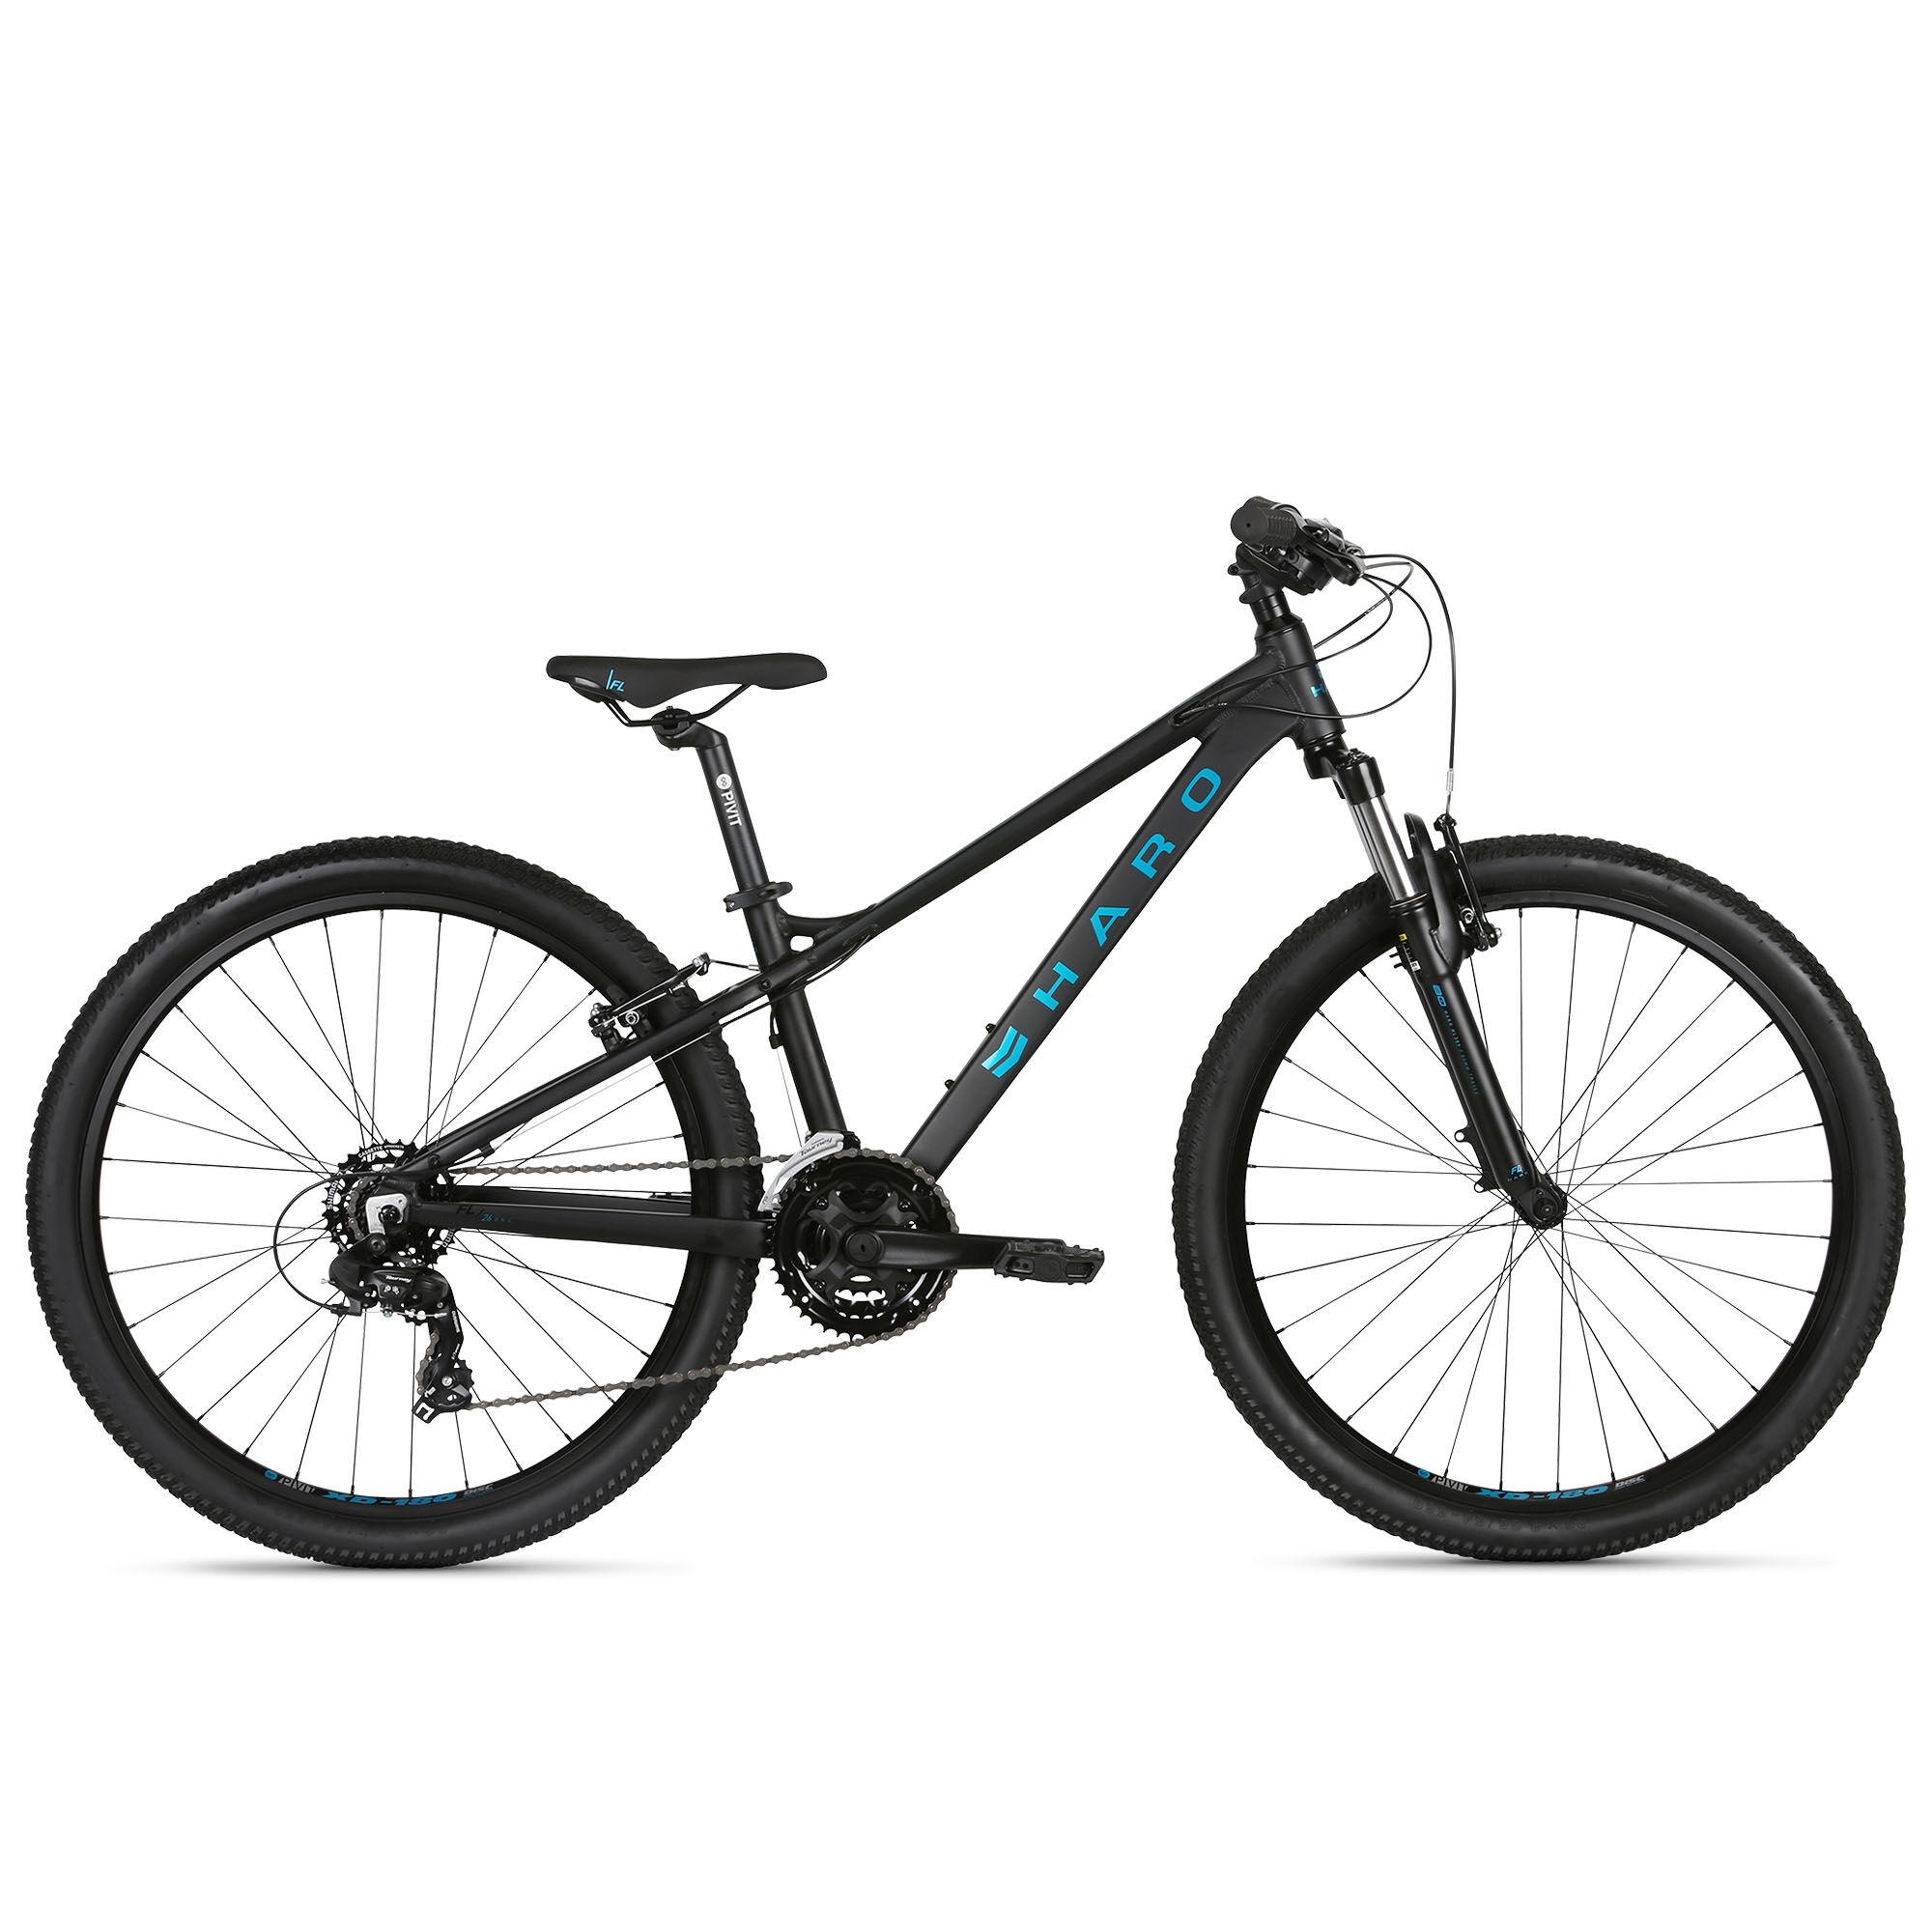 Haro Boy's Flightline 26 Youth Bike '21  - Grey Fade - Size: 26